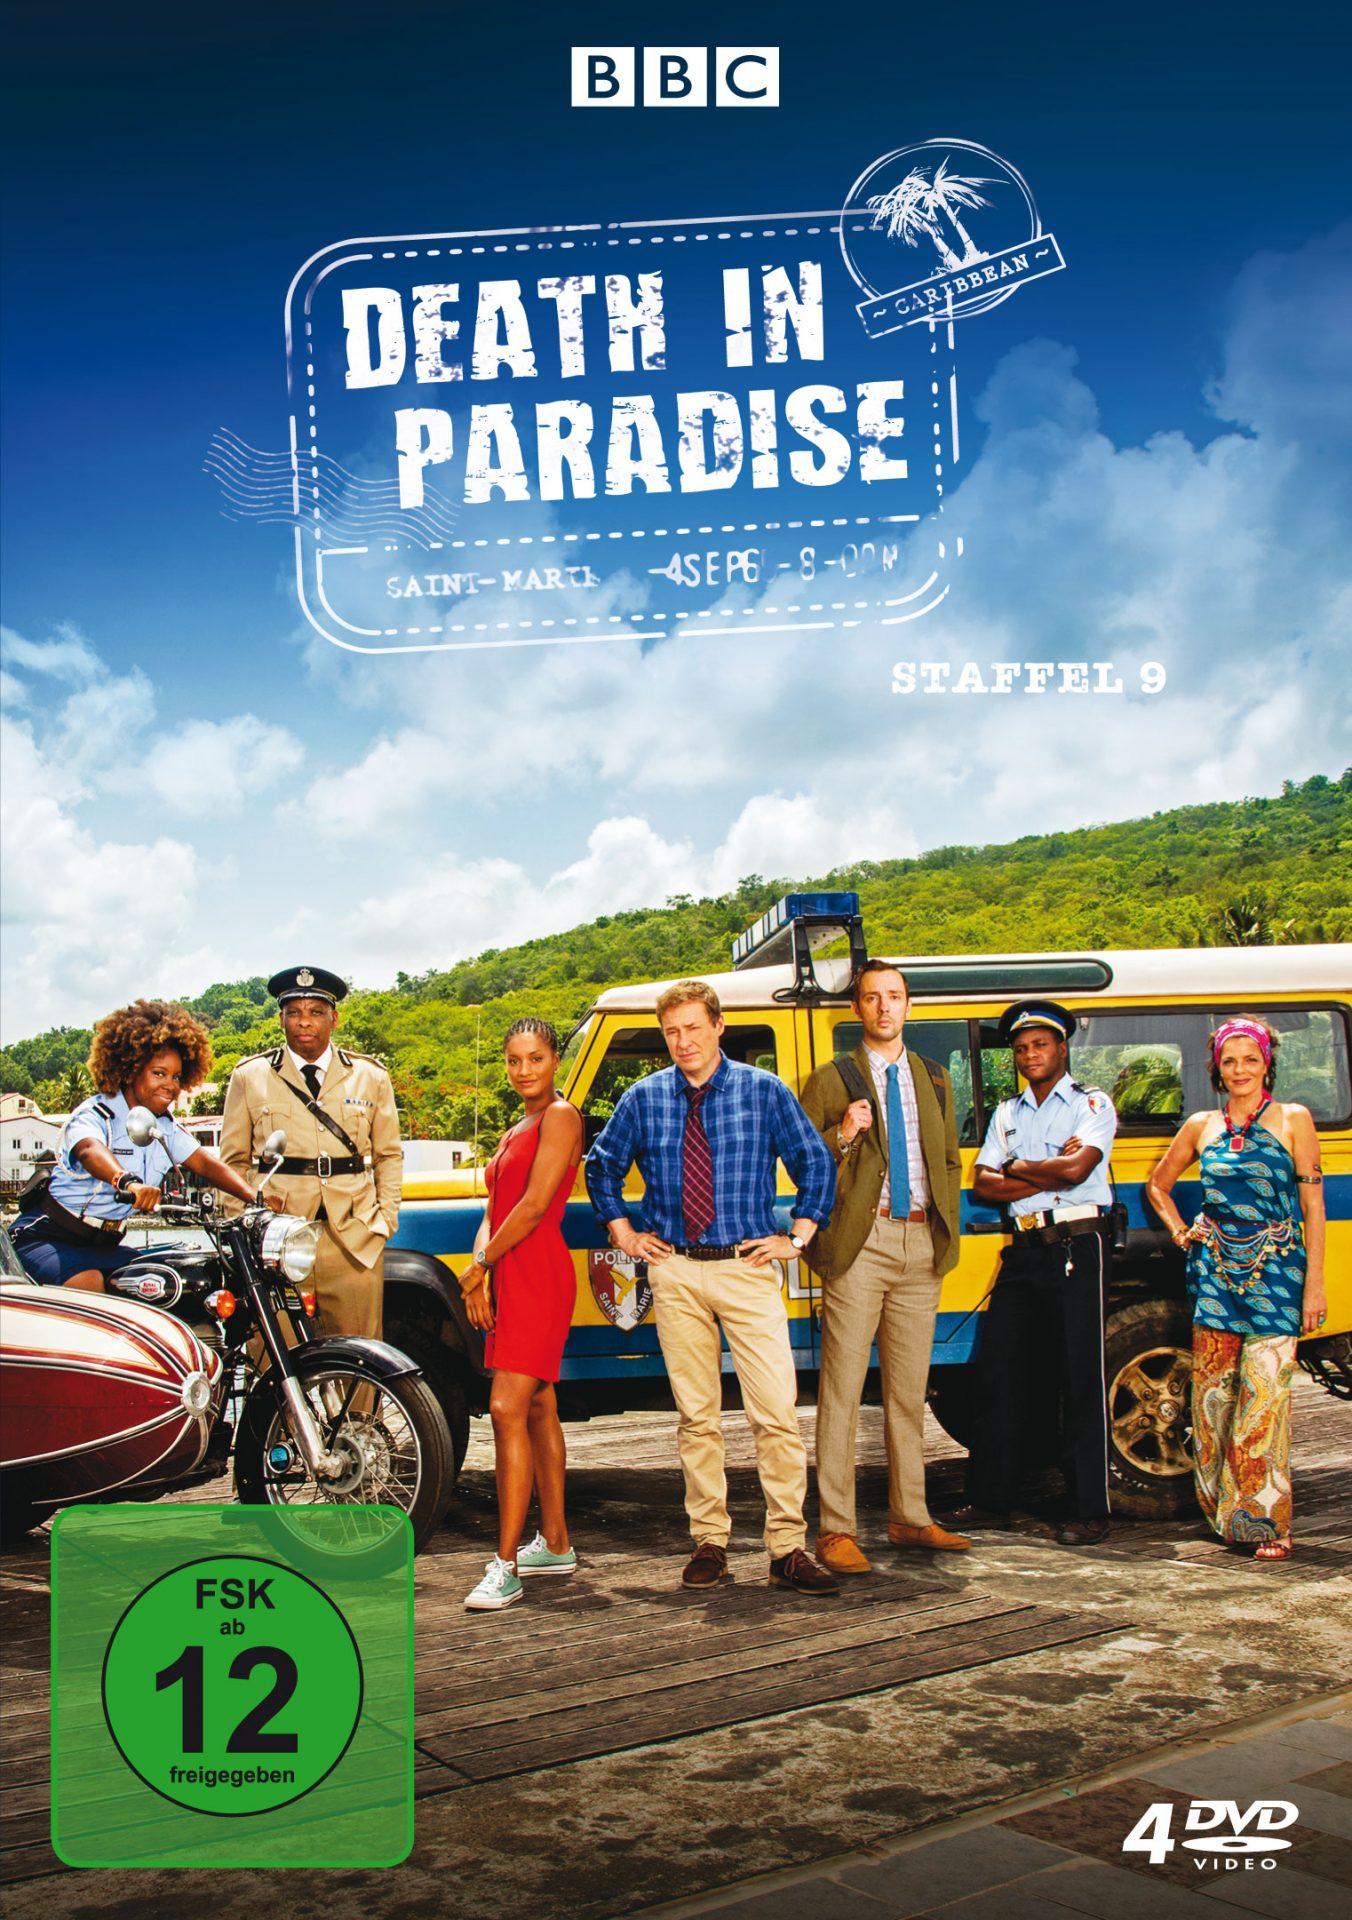 Death in Paradise Staffel 9 DVD